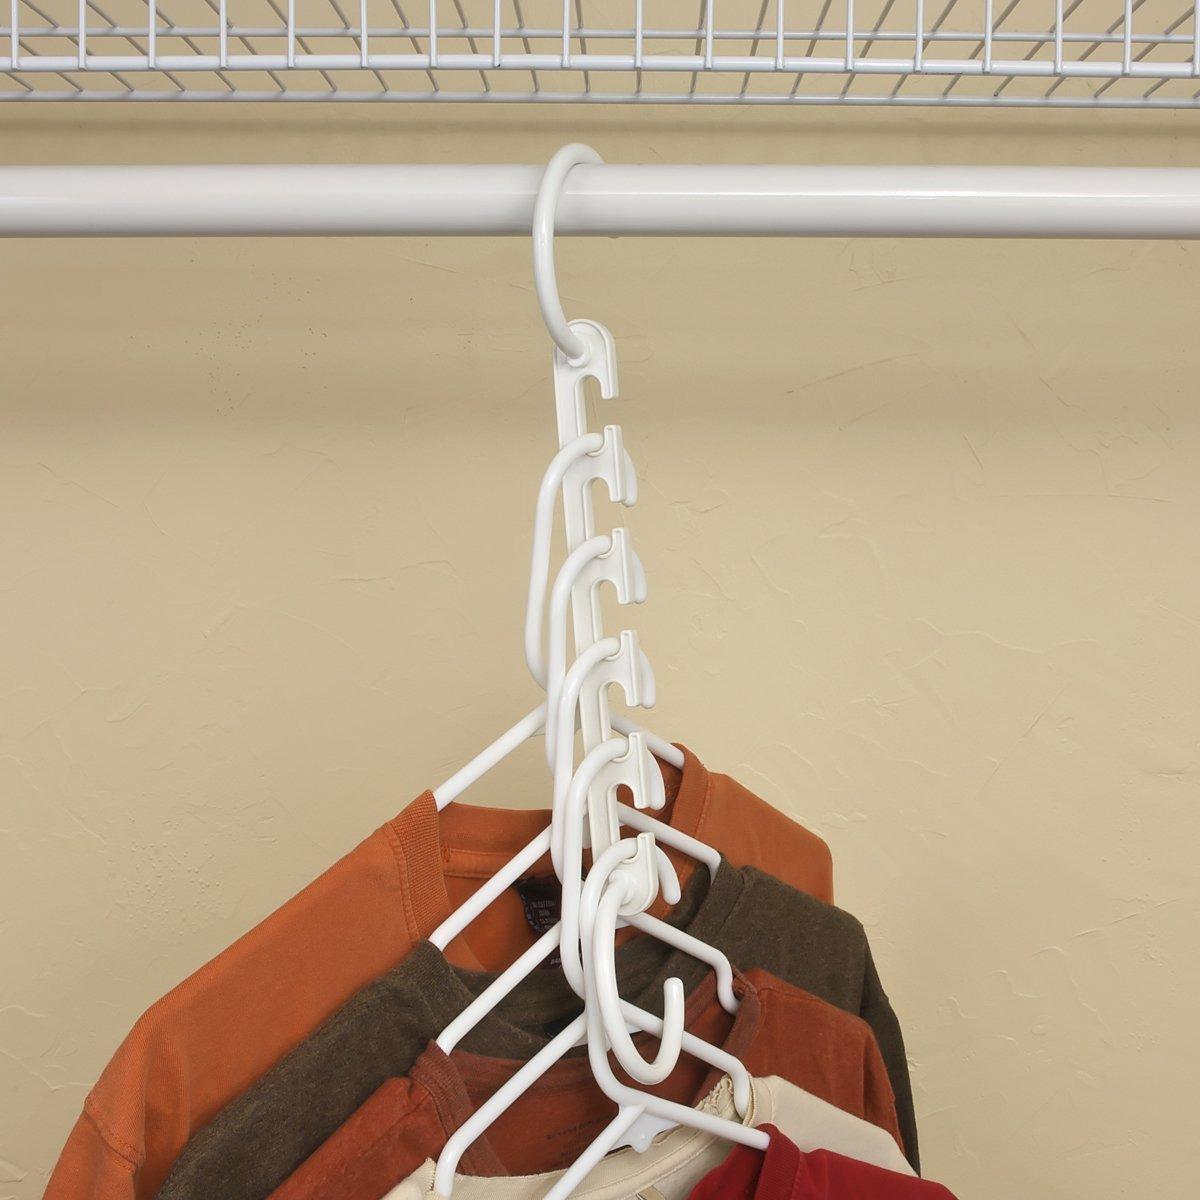 Hanger Space Saver